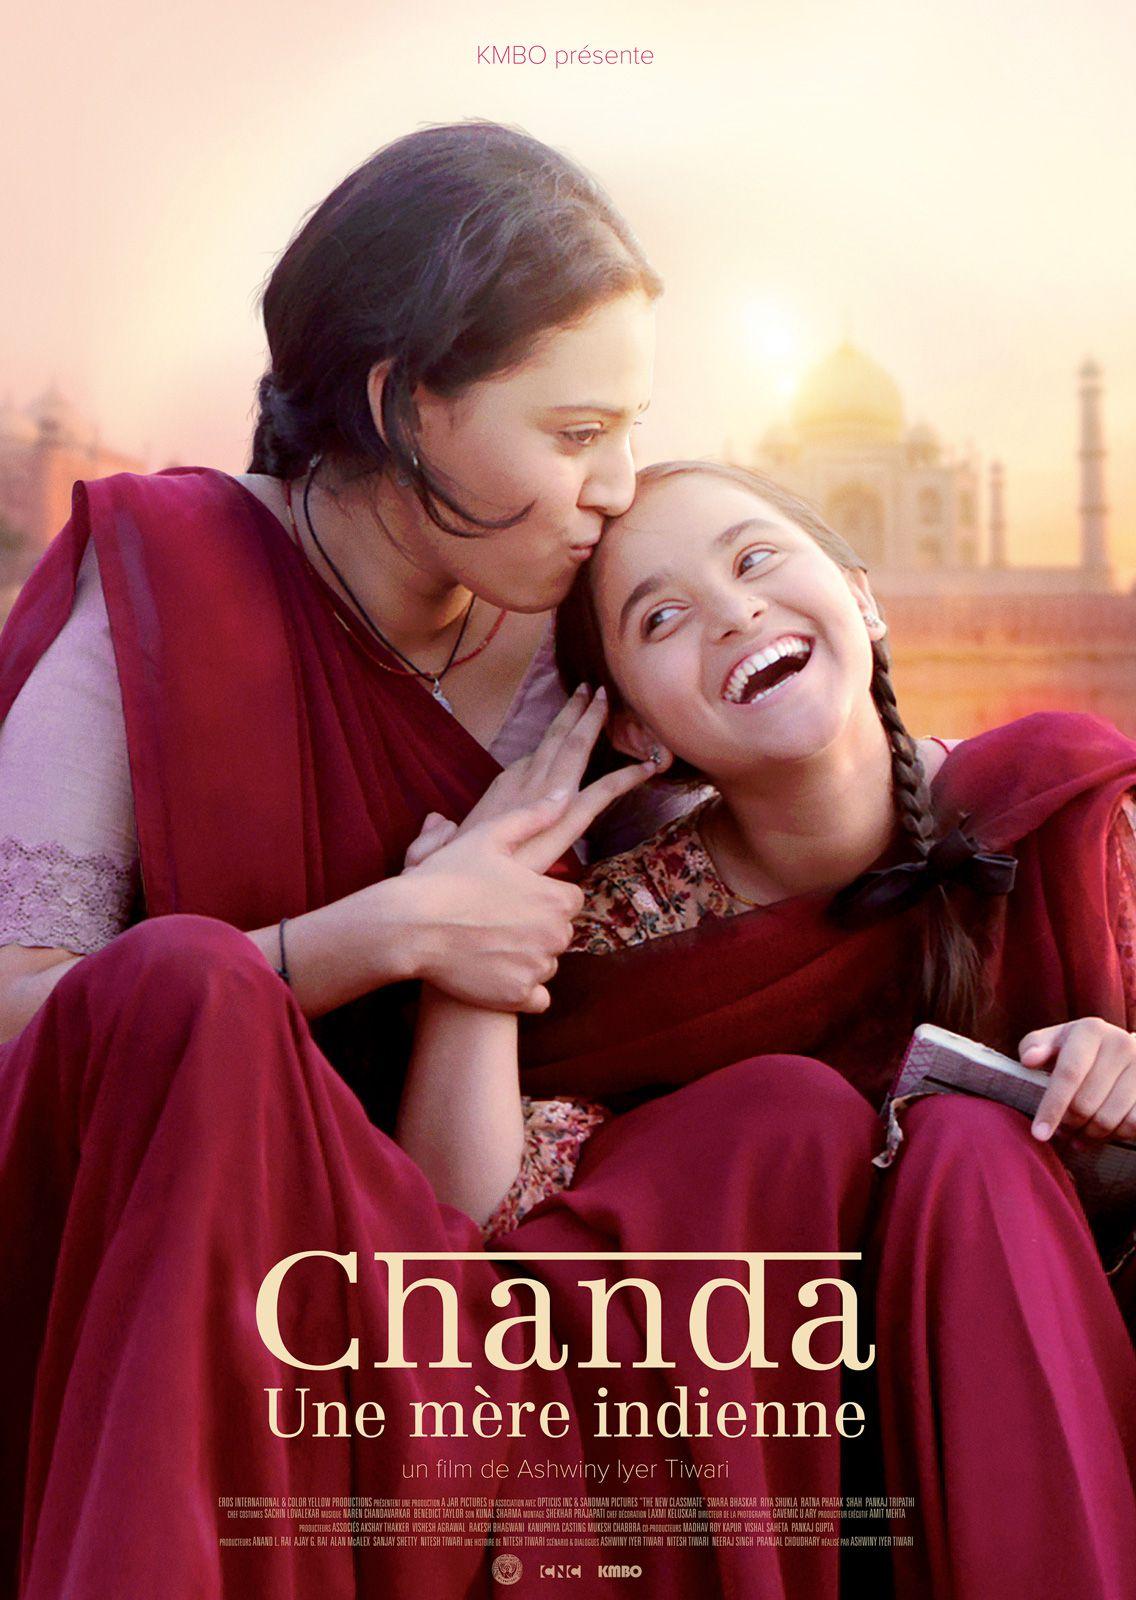 Torrent Un Indien Dans La Ville : torrent, indien, ville, Chanda,, Mère, Indienne, (2017), Torrent, Cpasbien